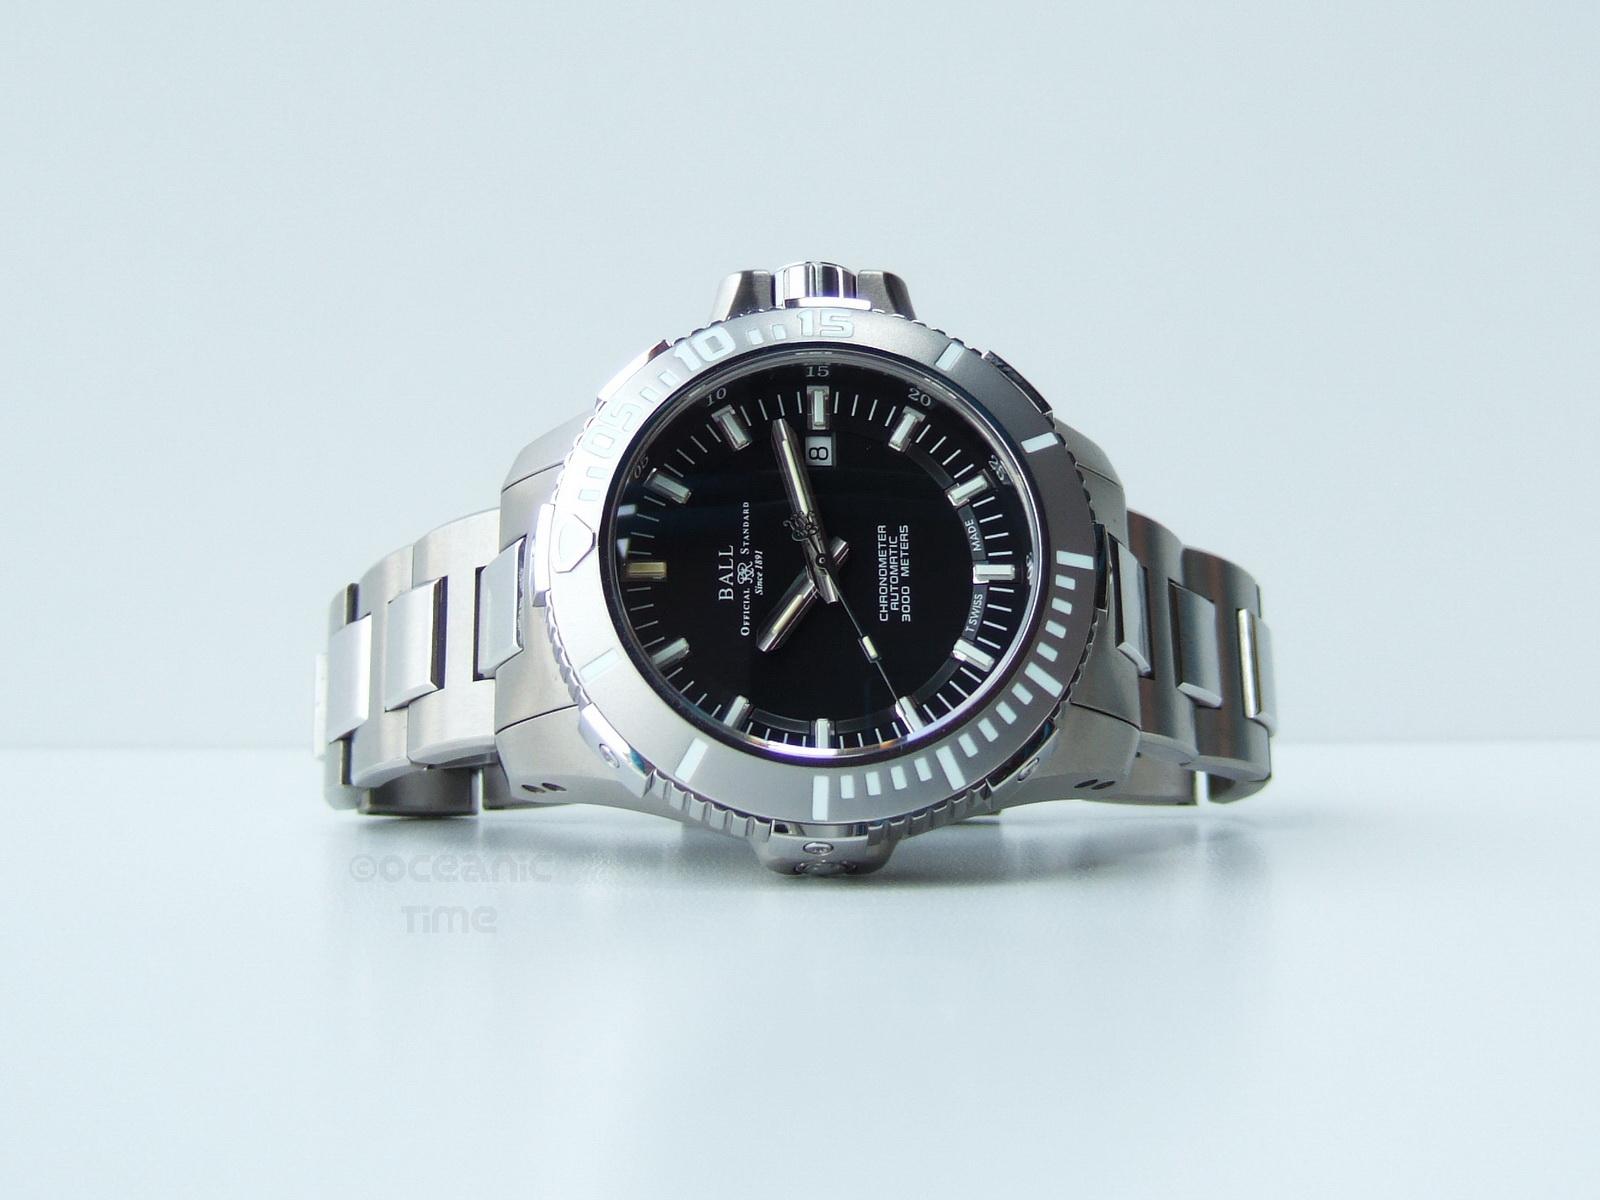 Сон подарок часы от мужчины